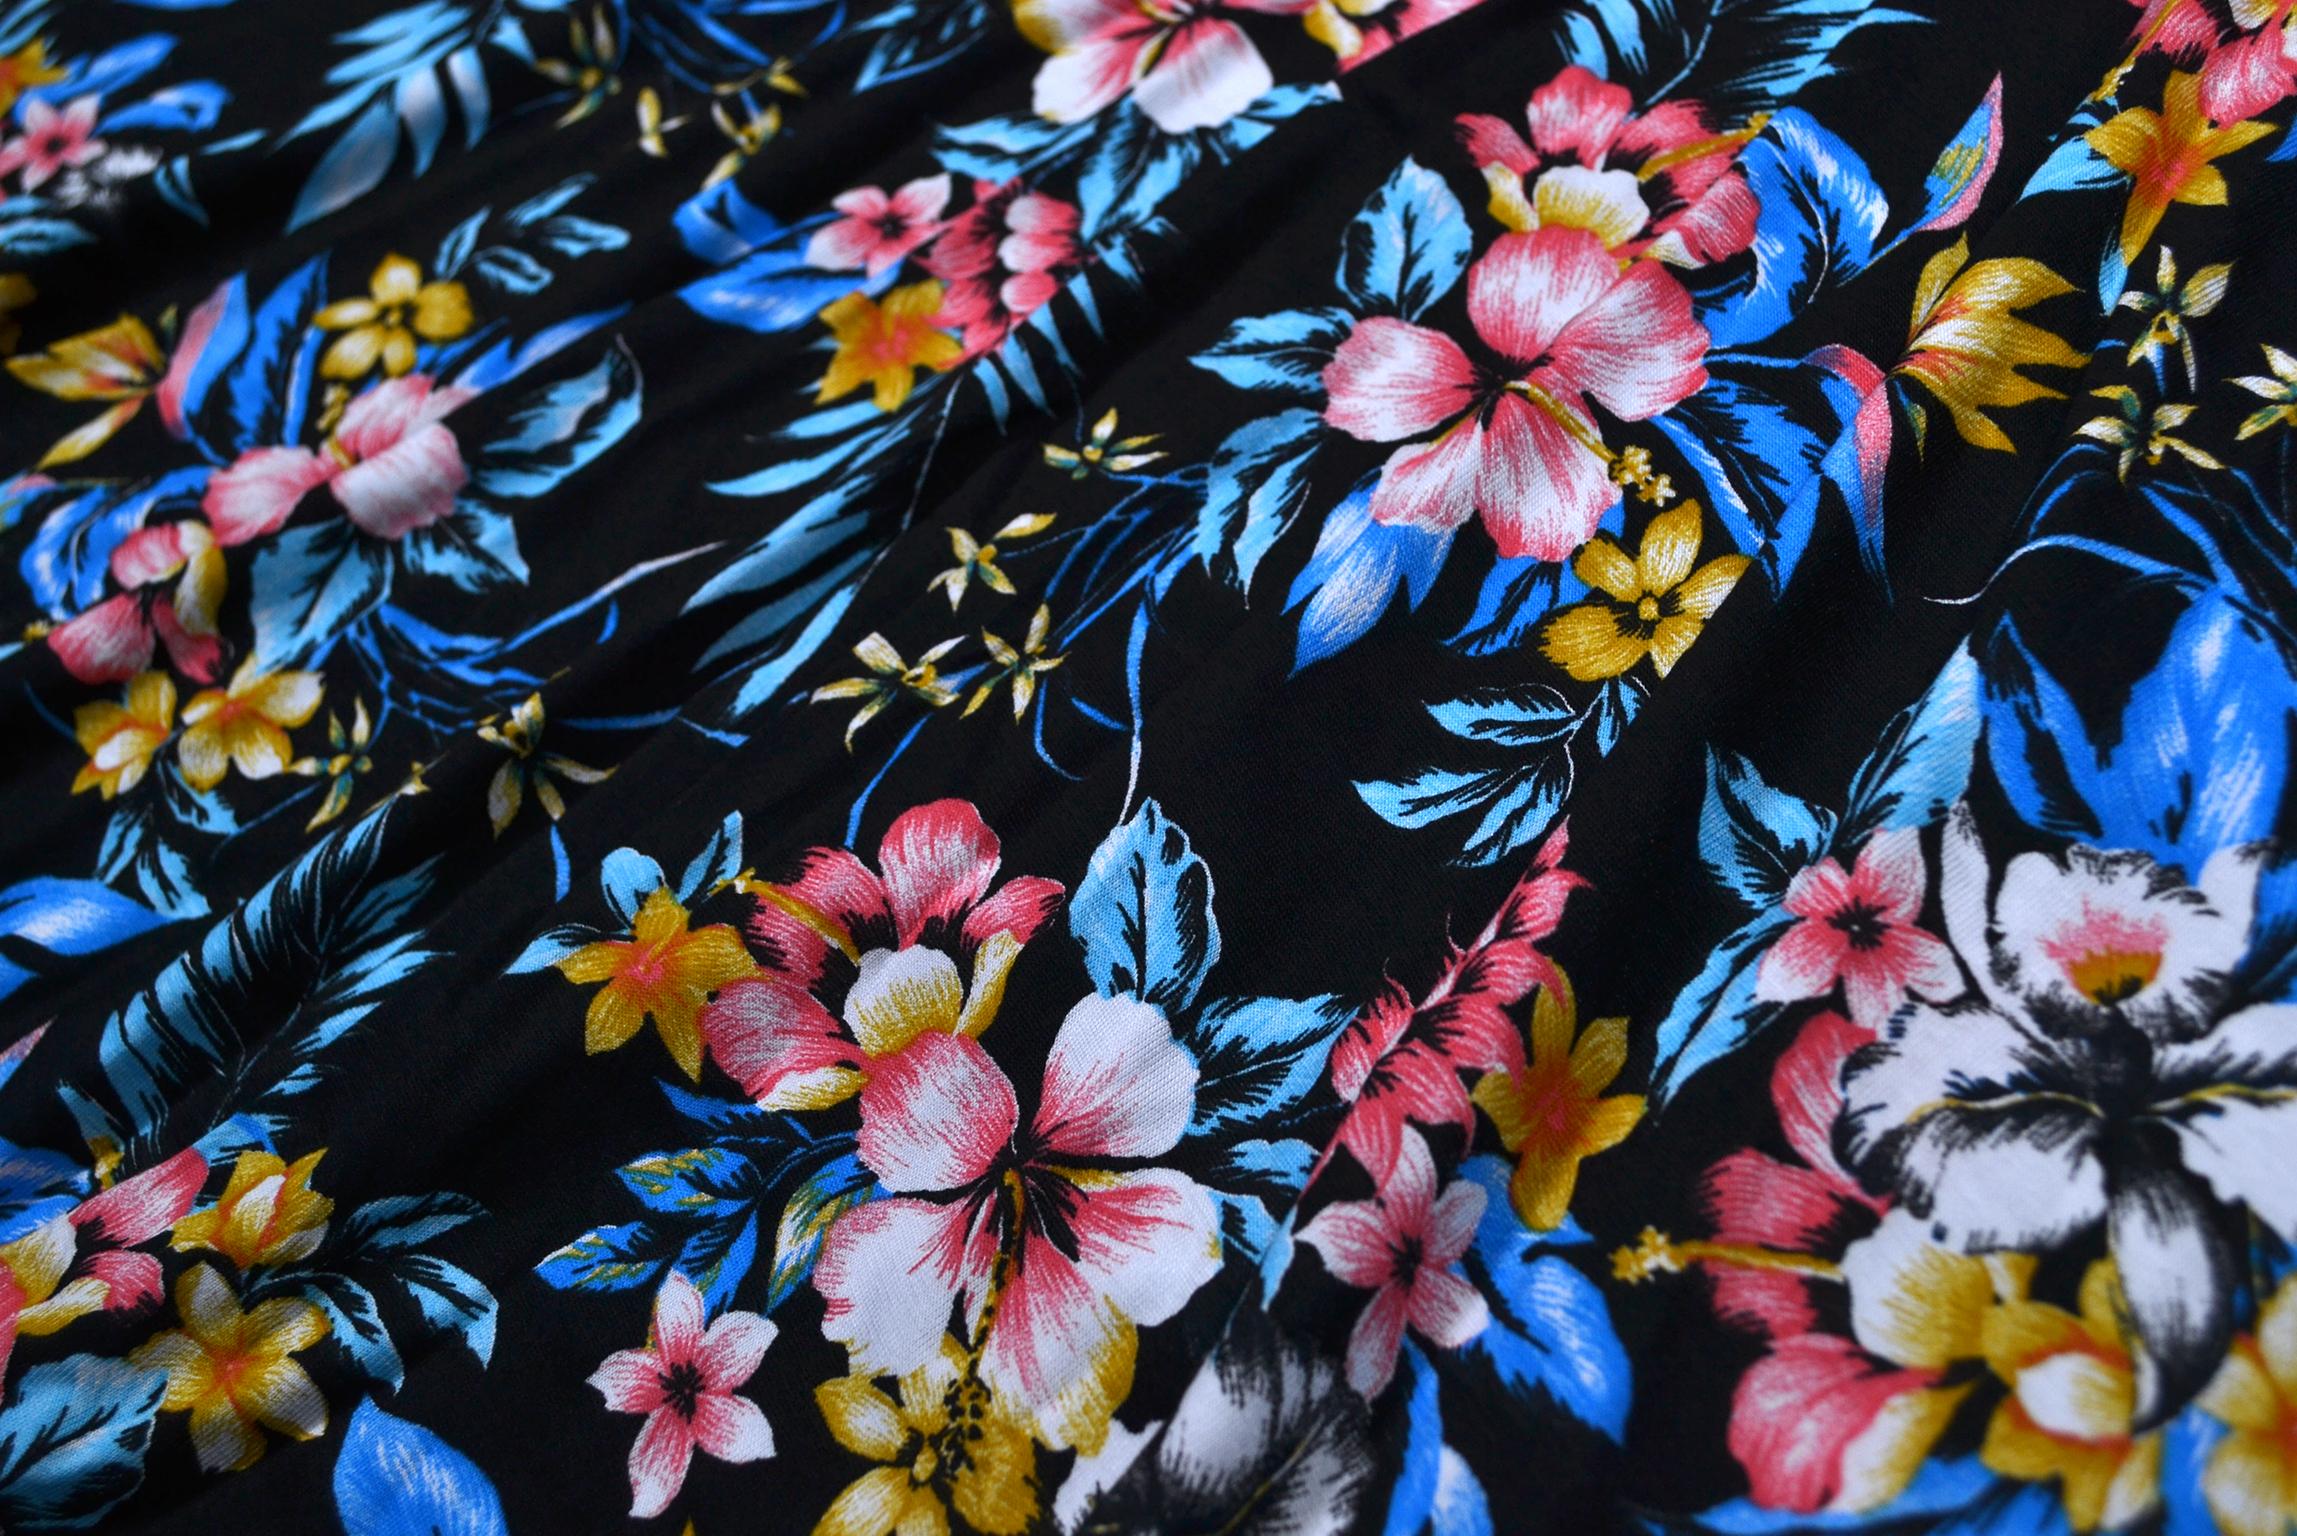 Girls-New-Floral-Skater-Dress-Kids-Summer-Party-Black-Dresses-7-8-9-10-11-12-13Y thumbnail 5